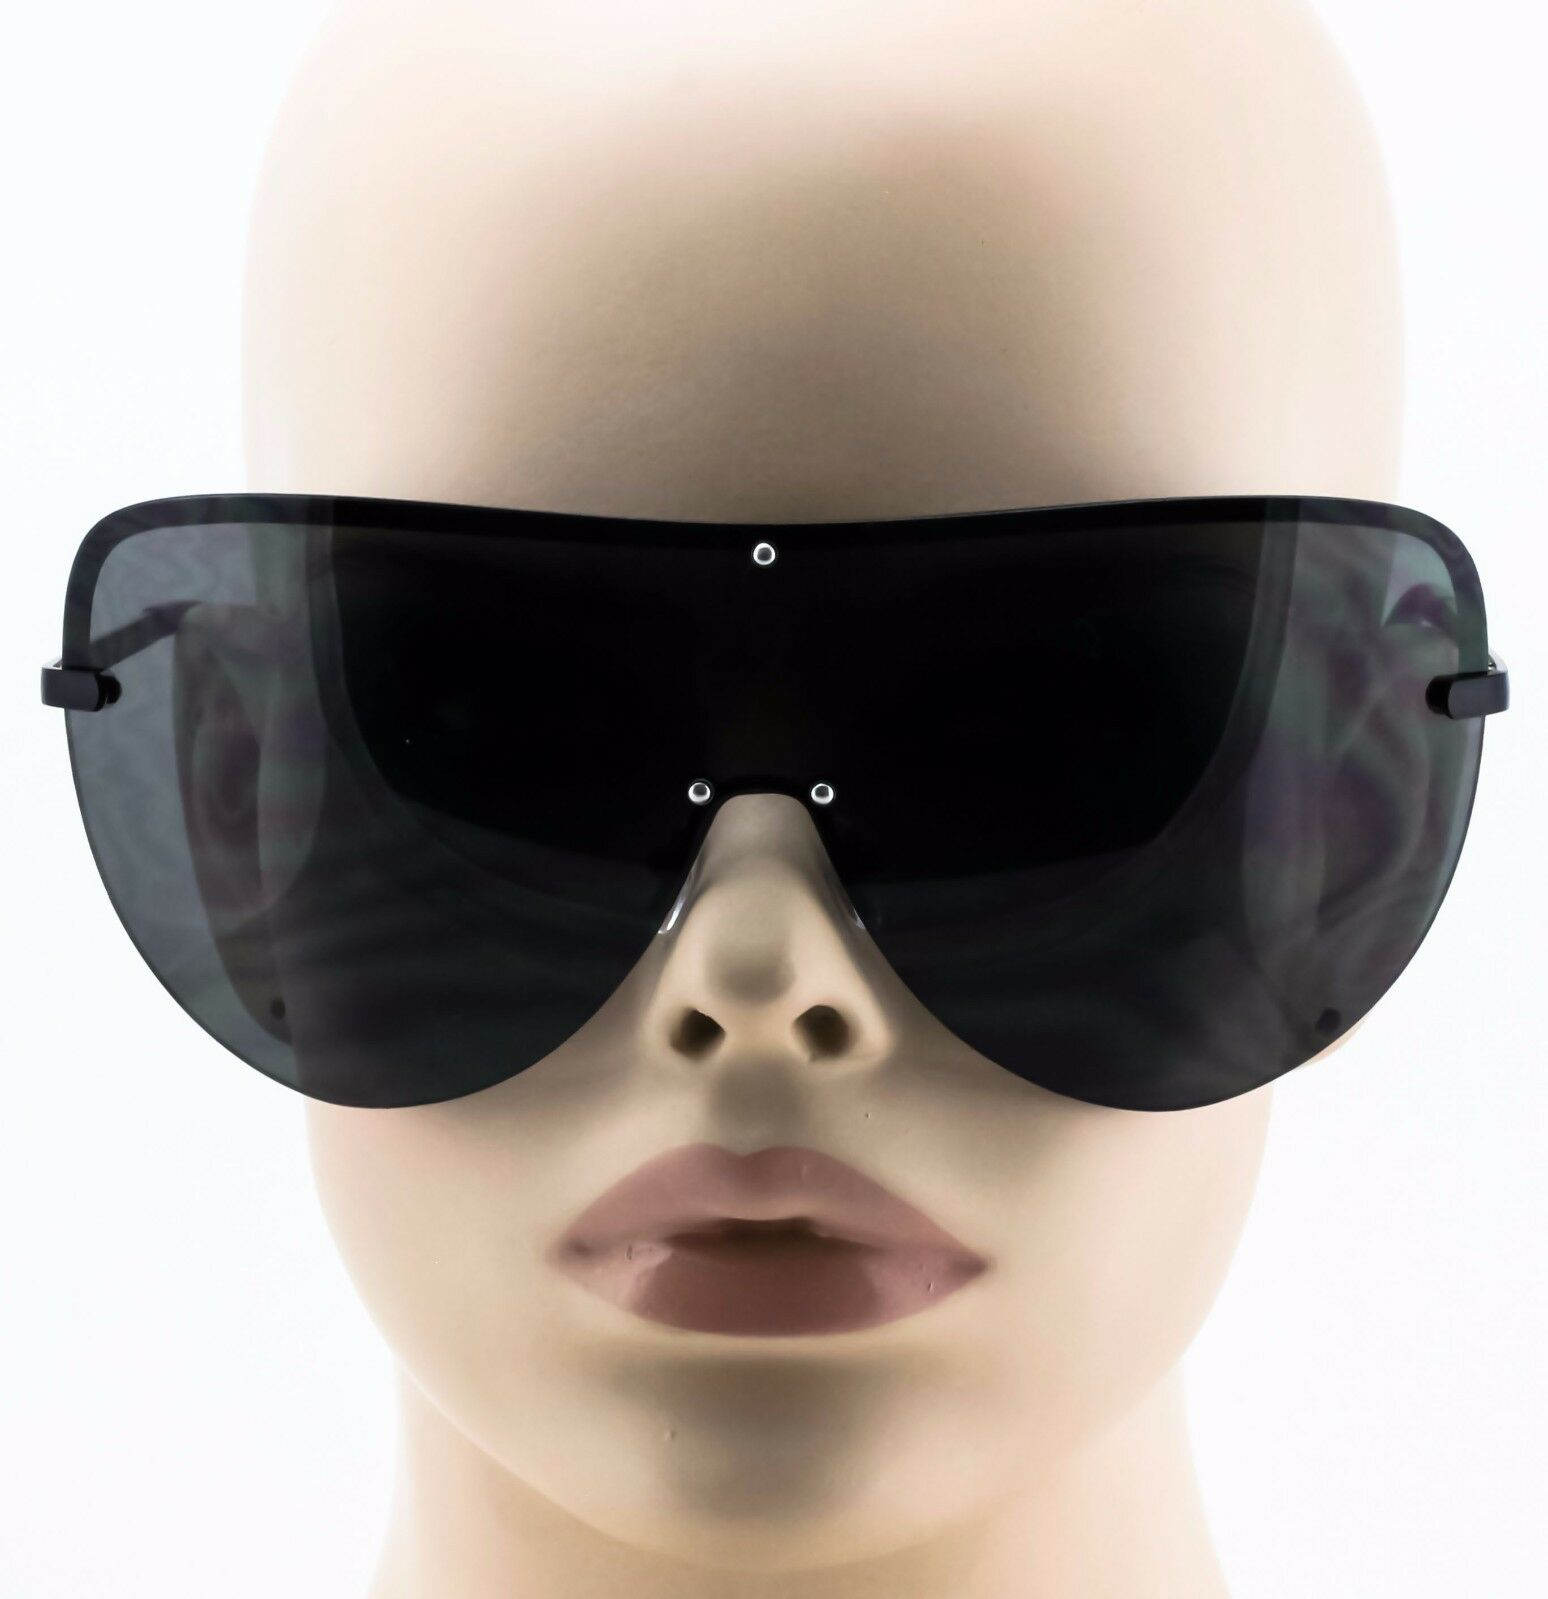 b87726076f1 Elite XXXL Oversized HUGE Big Mask Shield Half Face Owen Large Sunglasses  165 for sale online